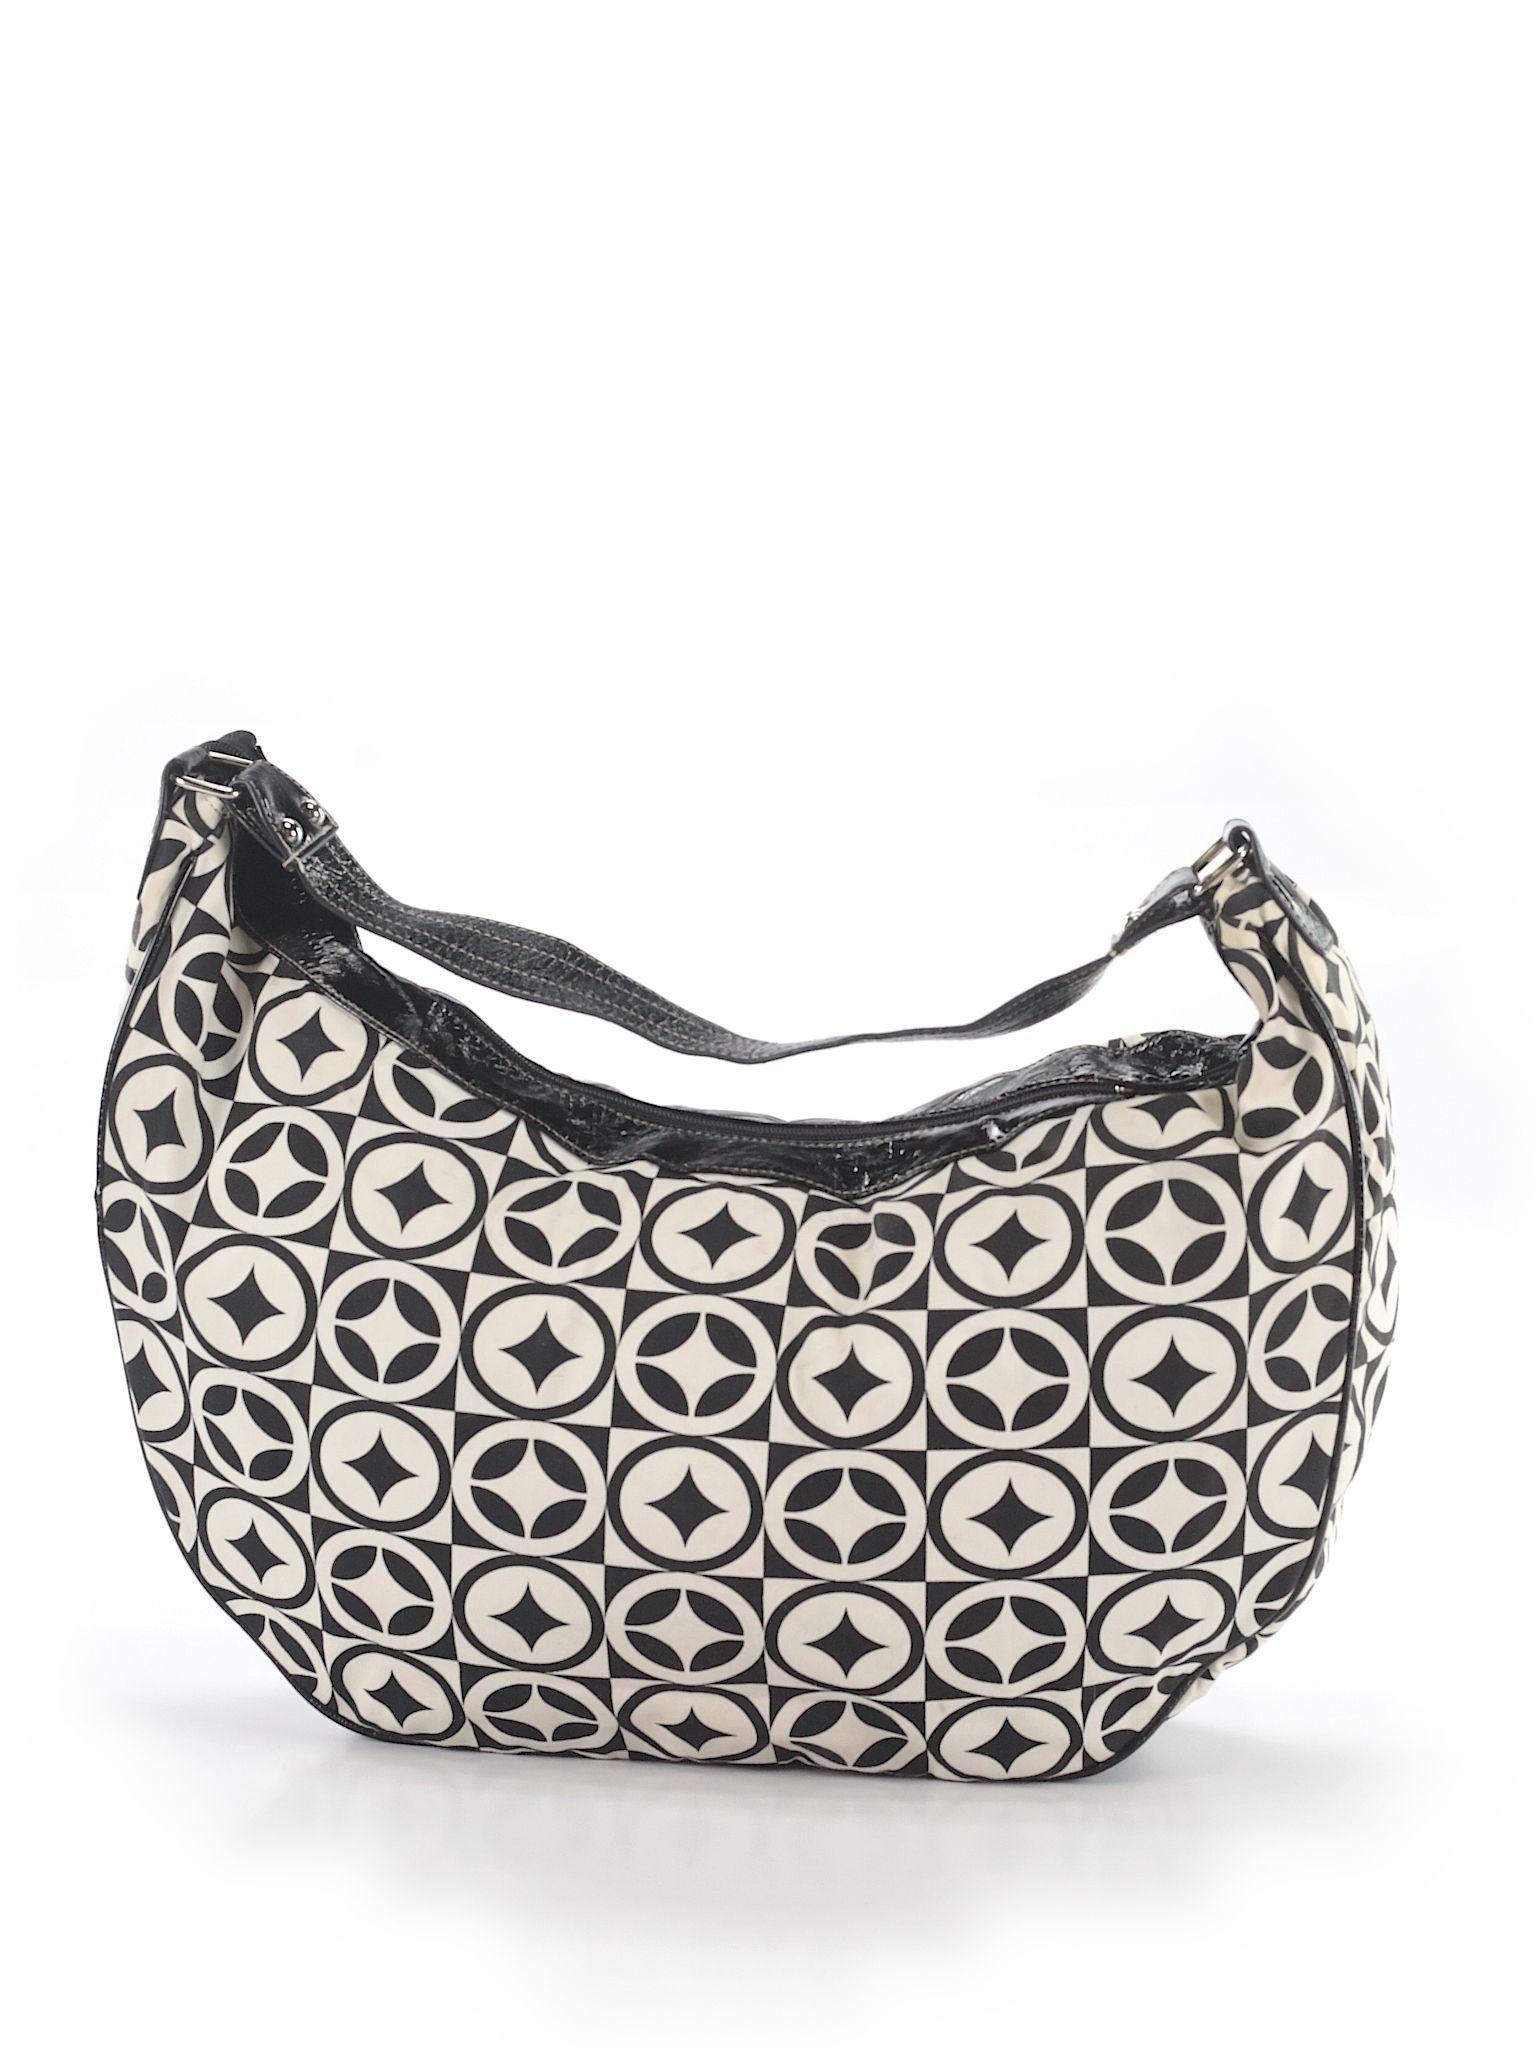 Tianni Handbags Hobo Size Na Black Women S Bags 27 99